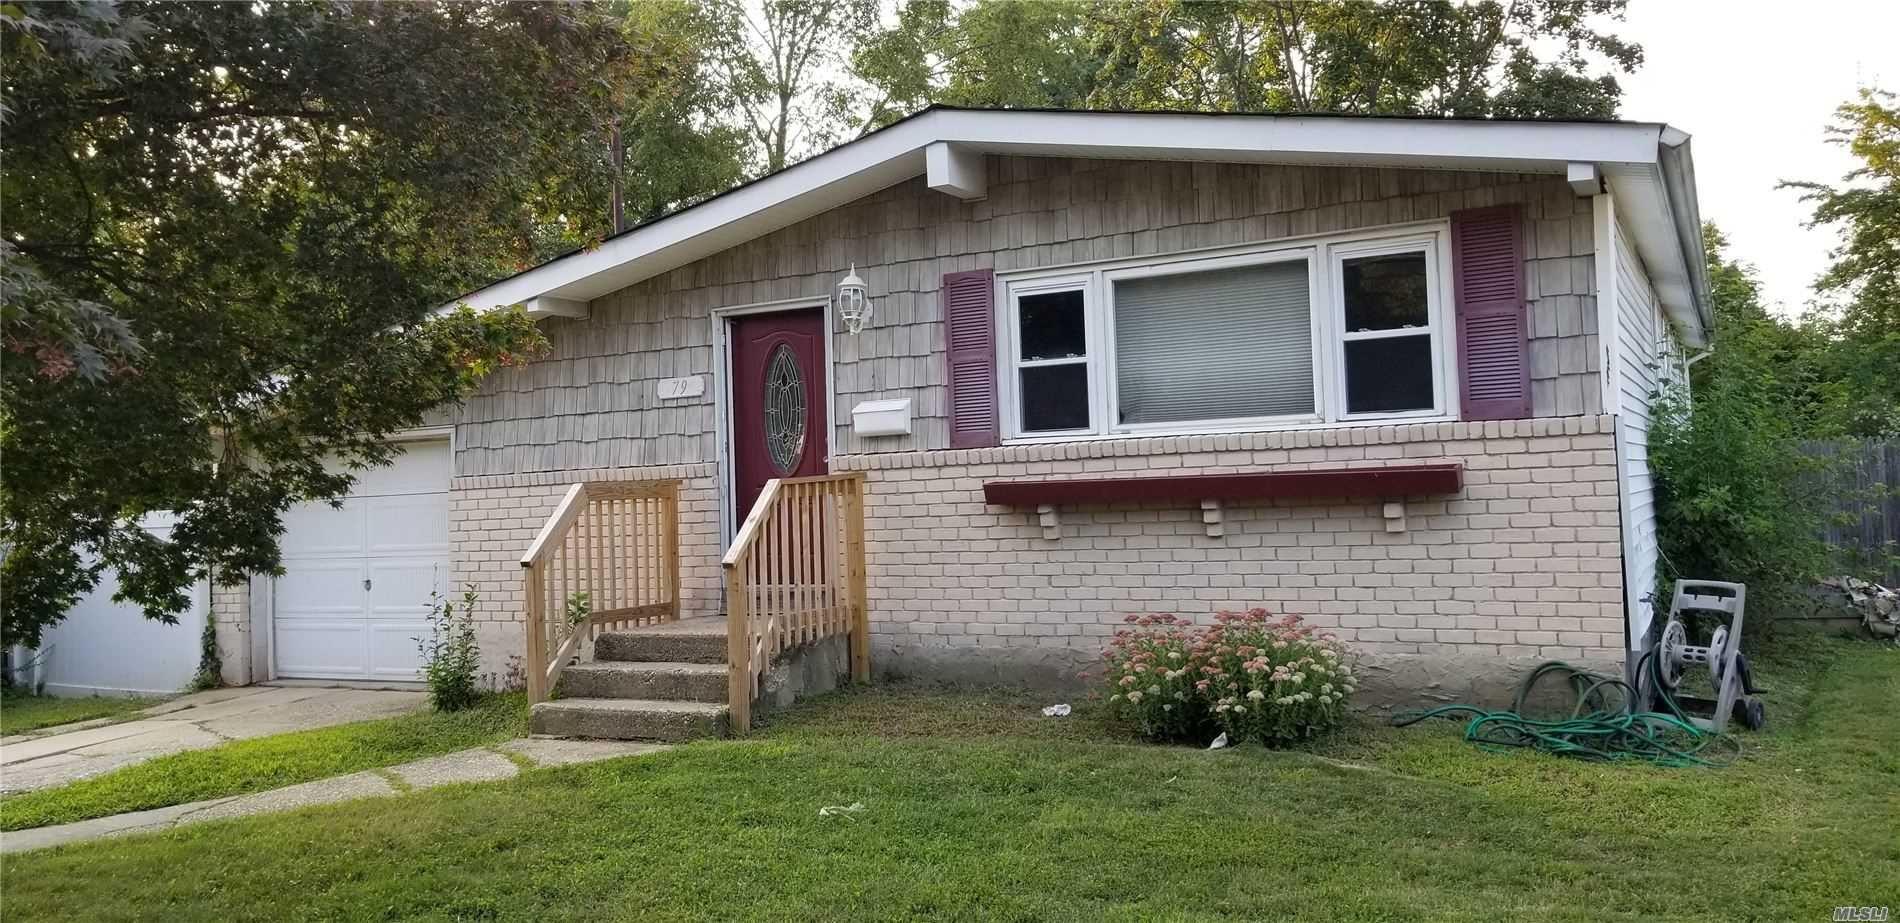 79 Prairie Drive, North Babylon, NY 11703 - MLS#: 3205402